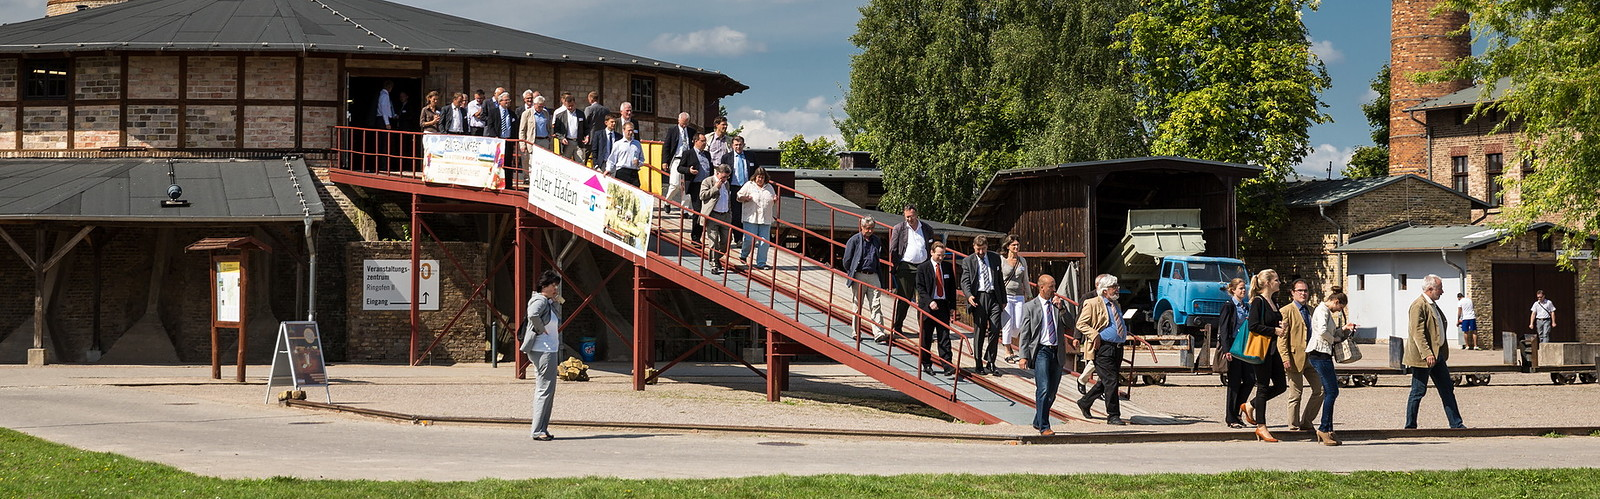 Mildenberg Brick Works Park (WInTO GmbH), photo: Mildenberg Brick